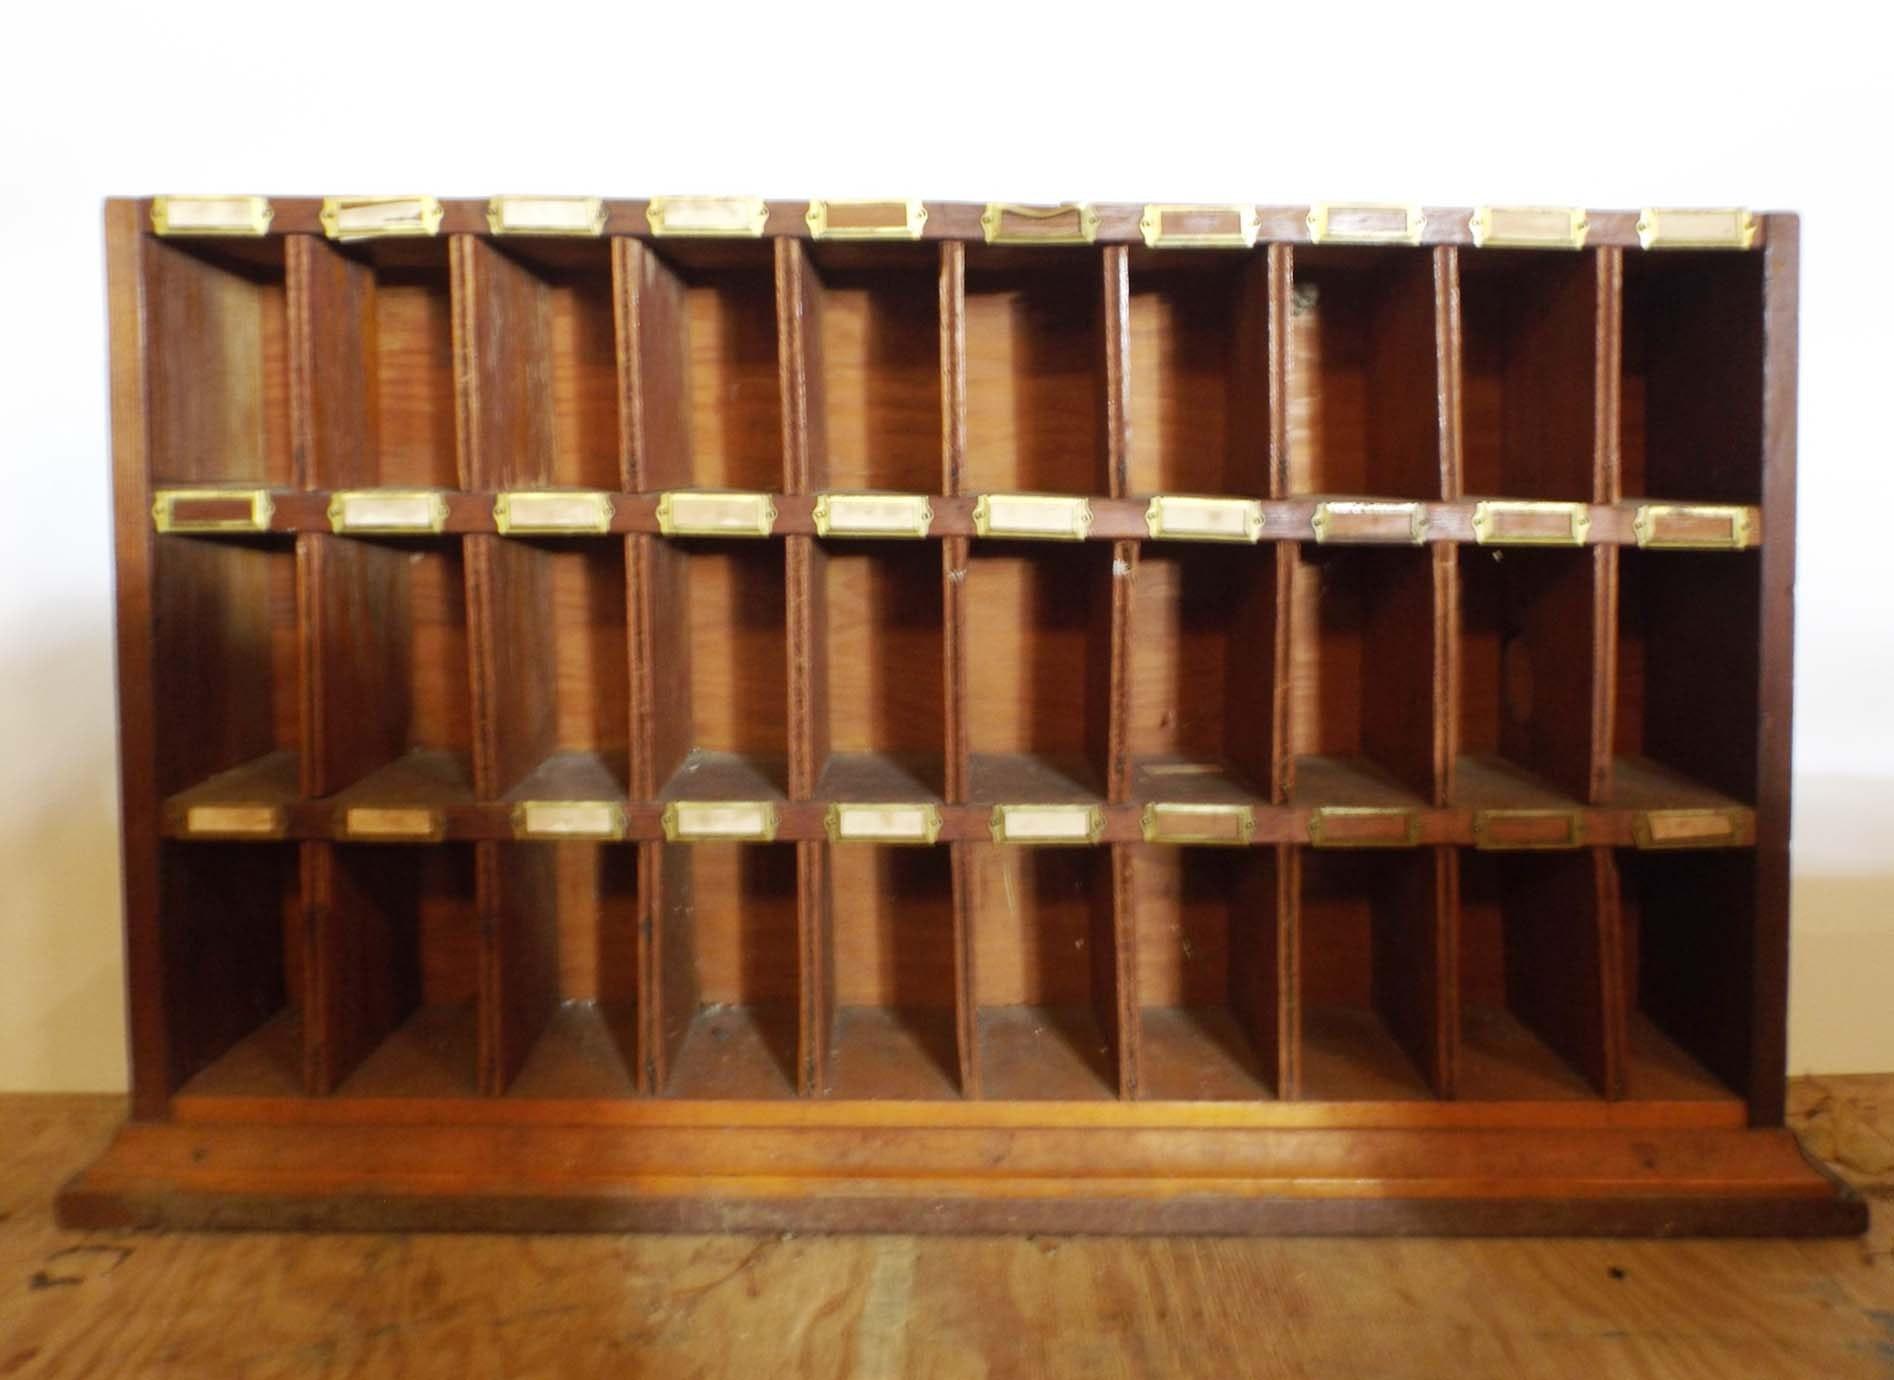 Wooden office mail slots team edge egg roulette